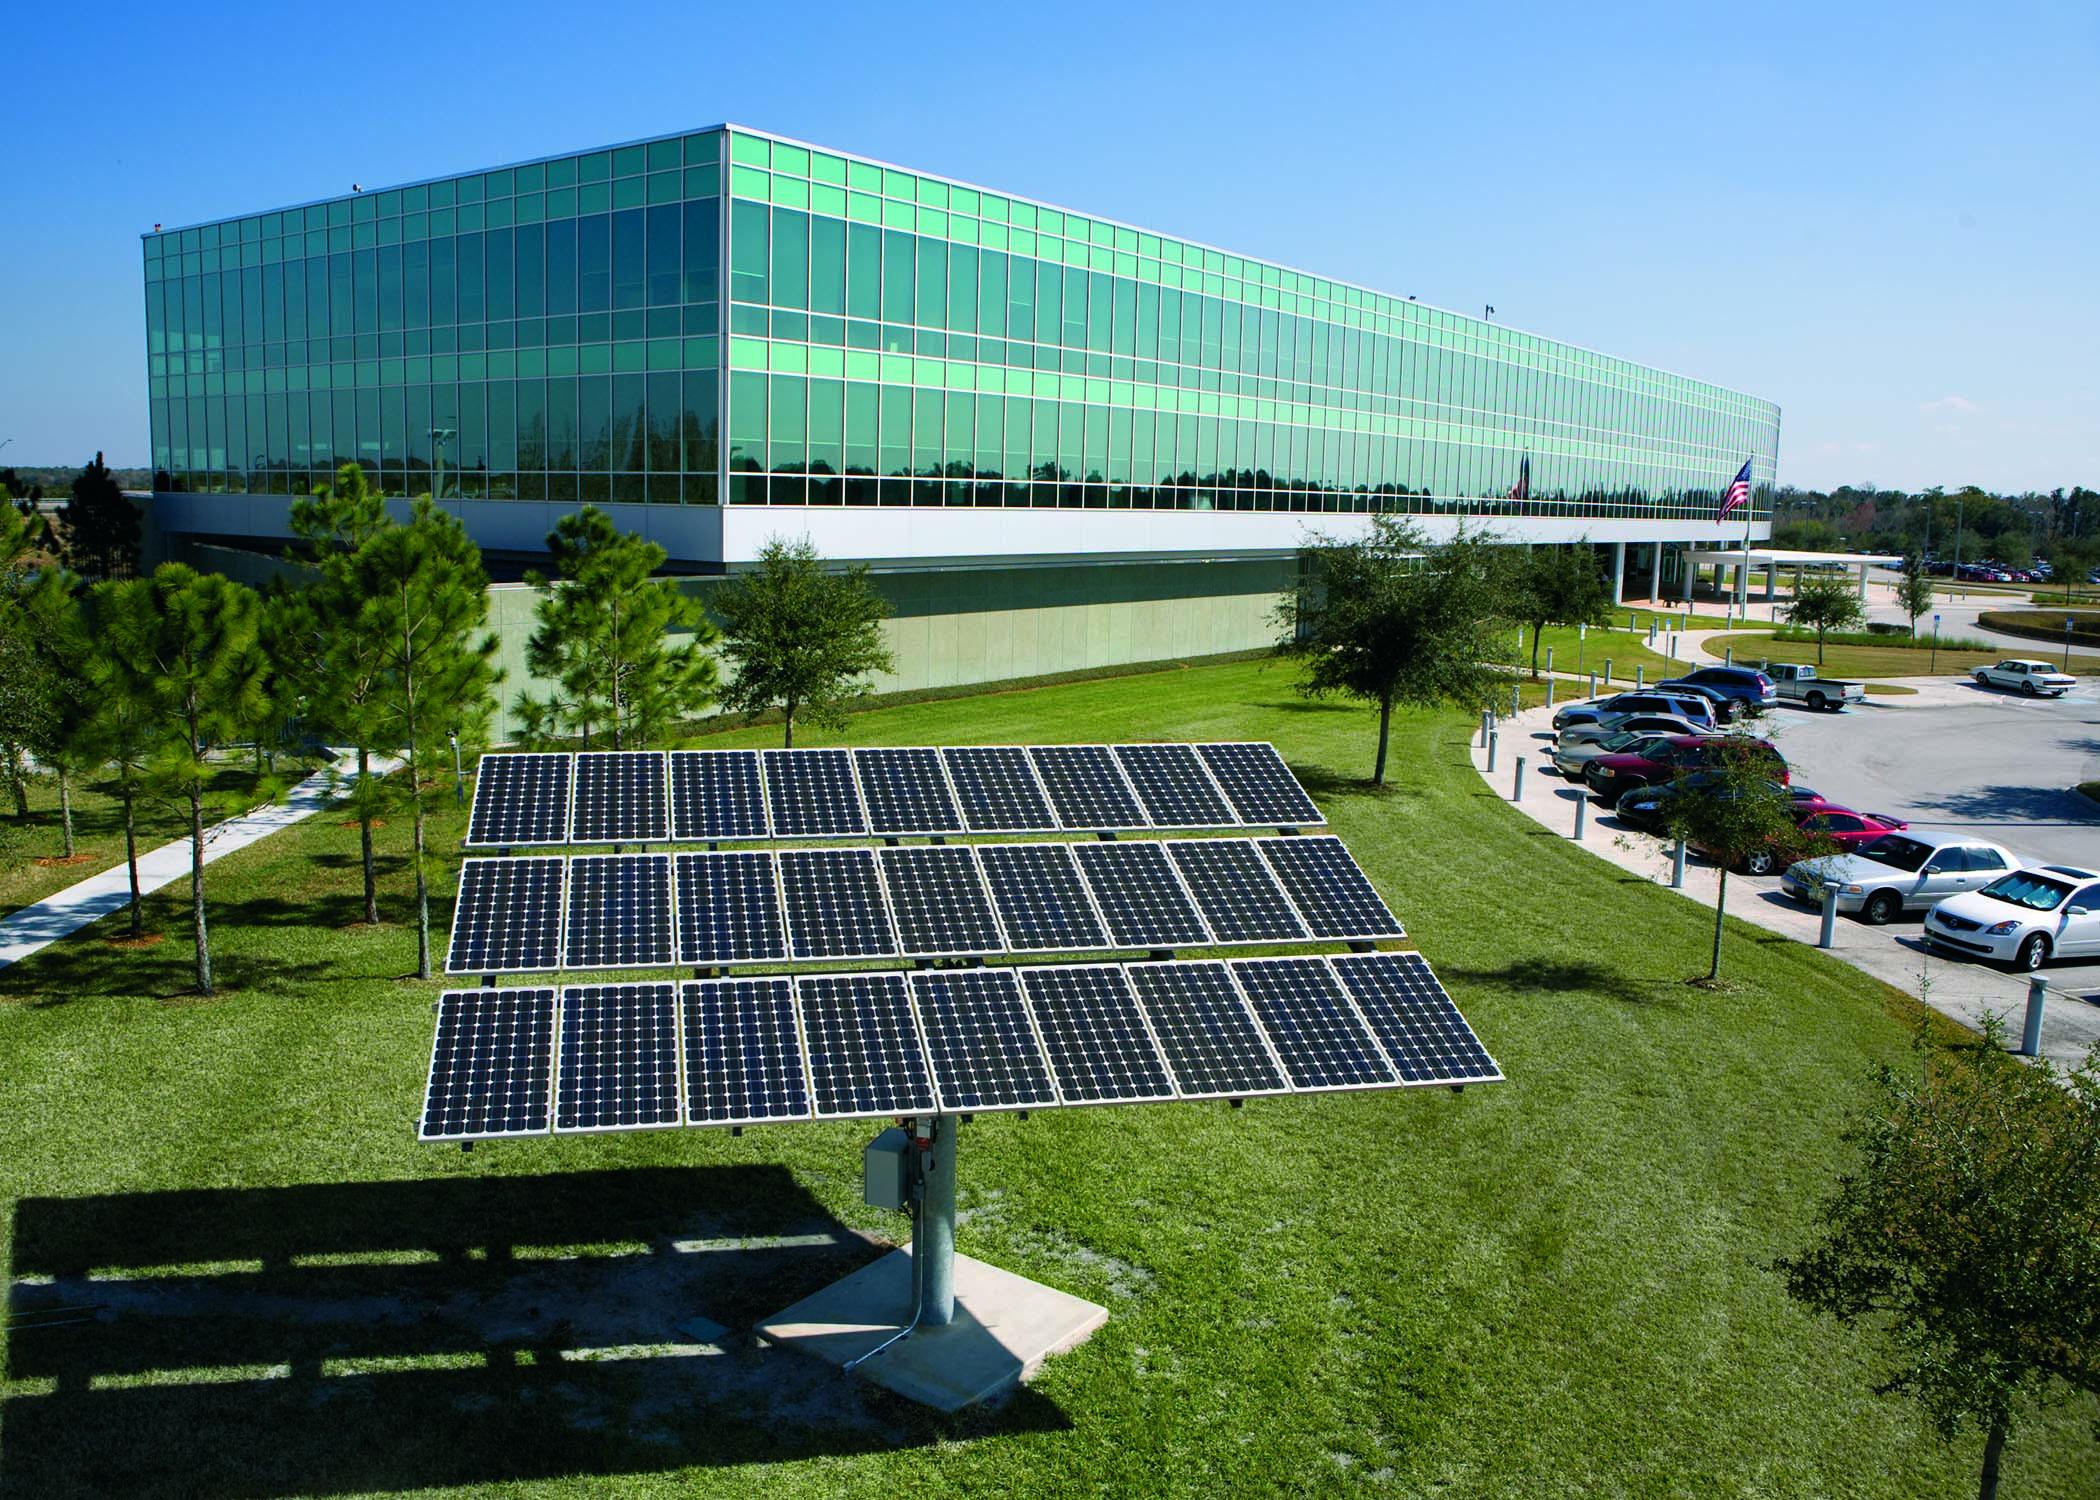 targeted industries lakeland economic development council corporate headquarters